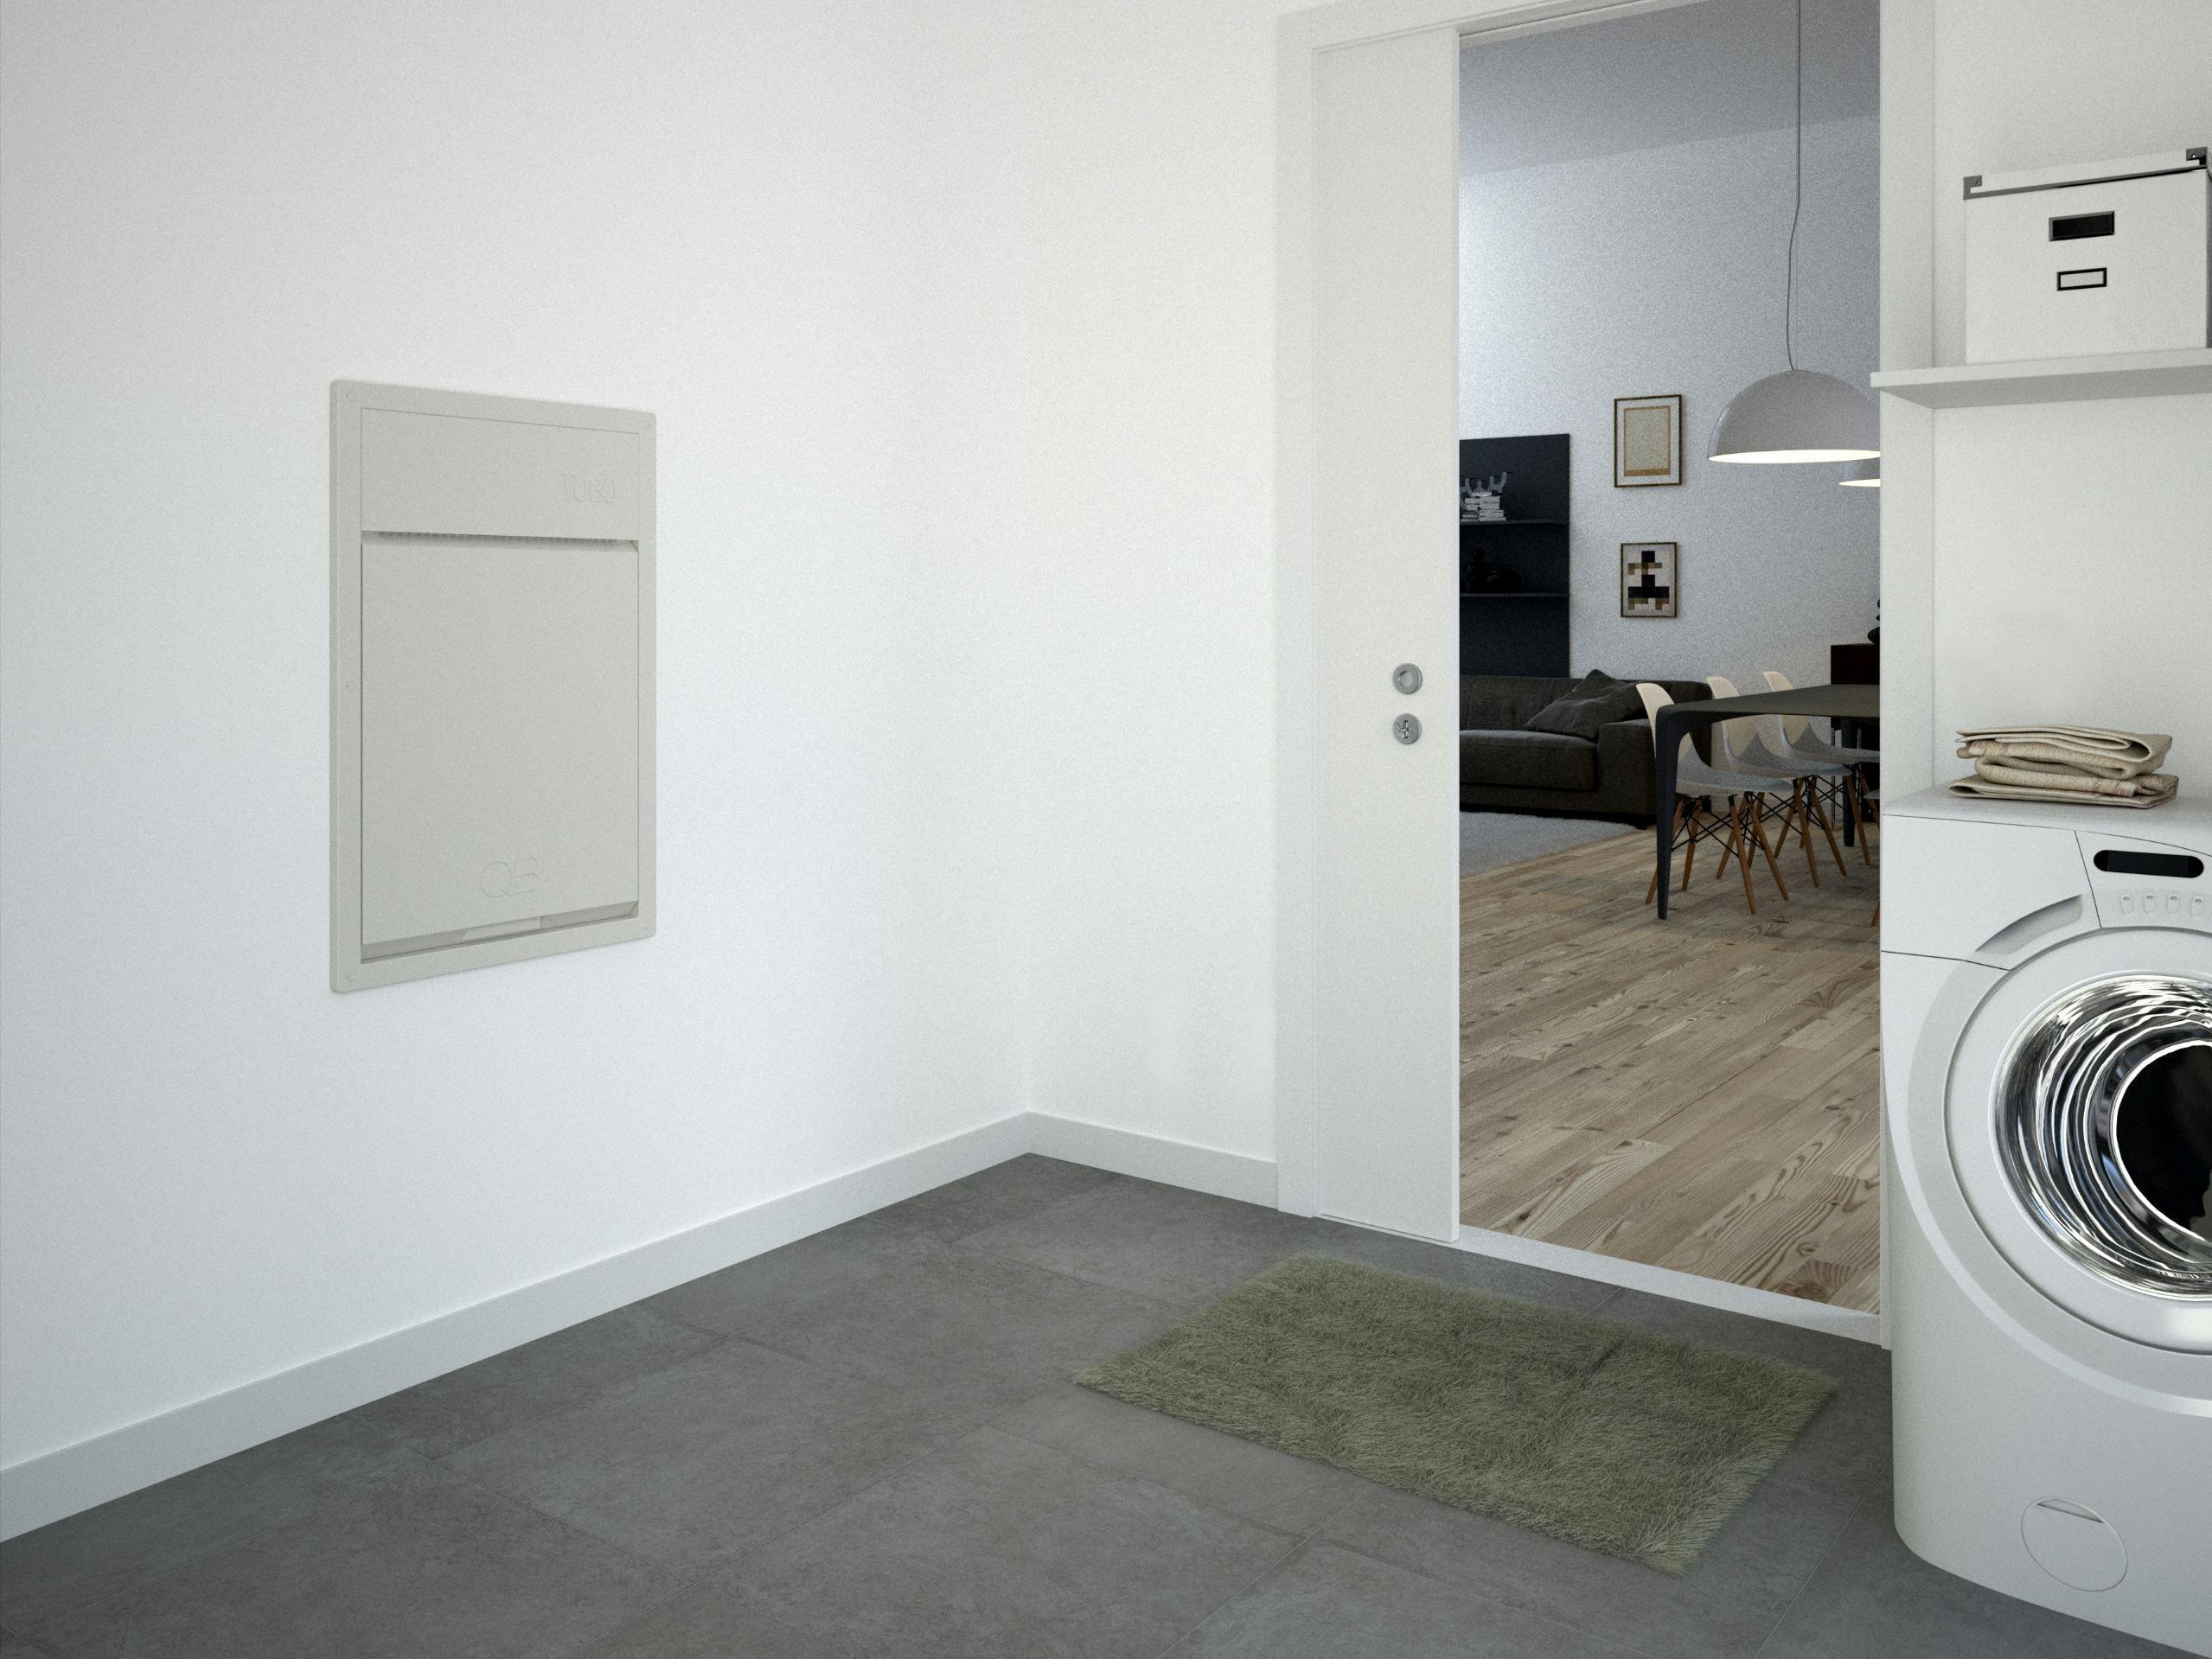 installation d aspiration centralis e qb encastrable by aertecnica. Black Bedroom Furniture Sets. Home Design Ideas